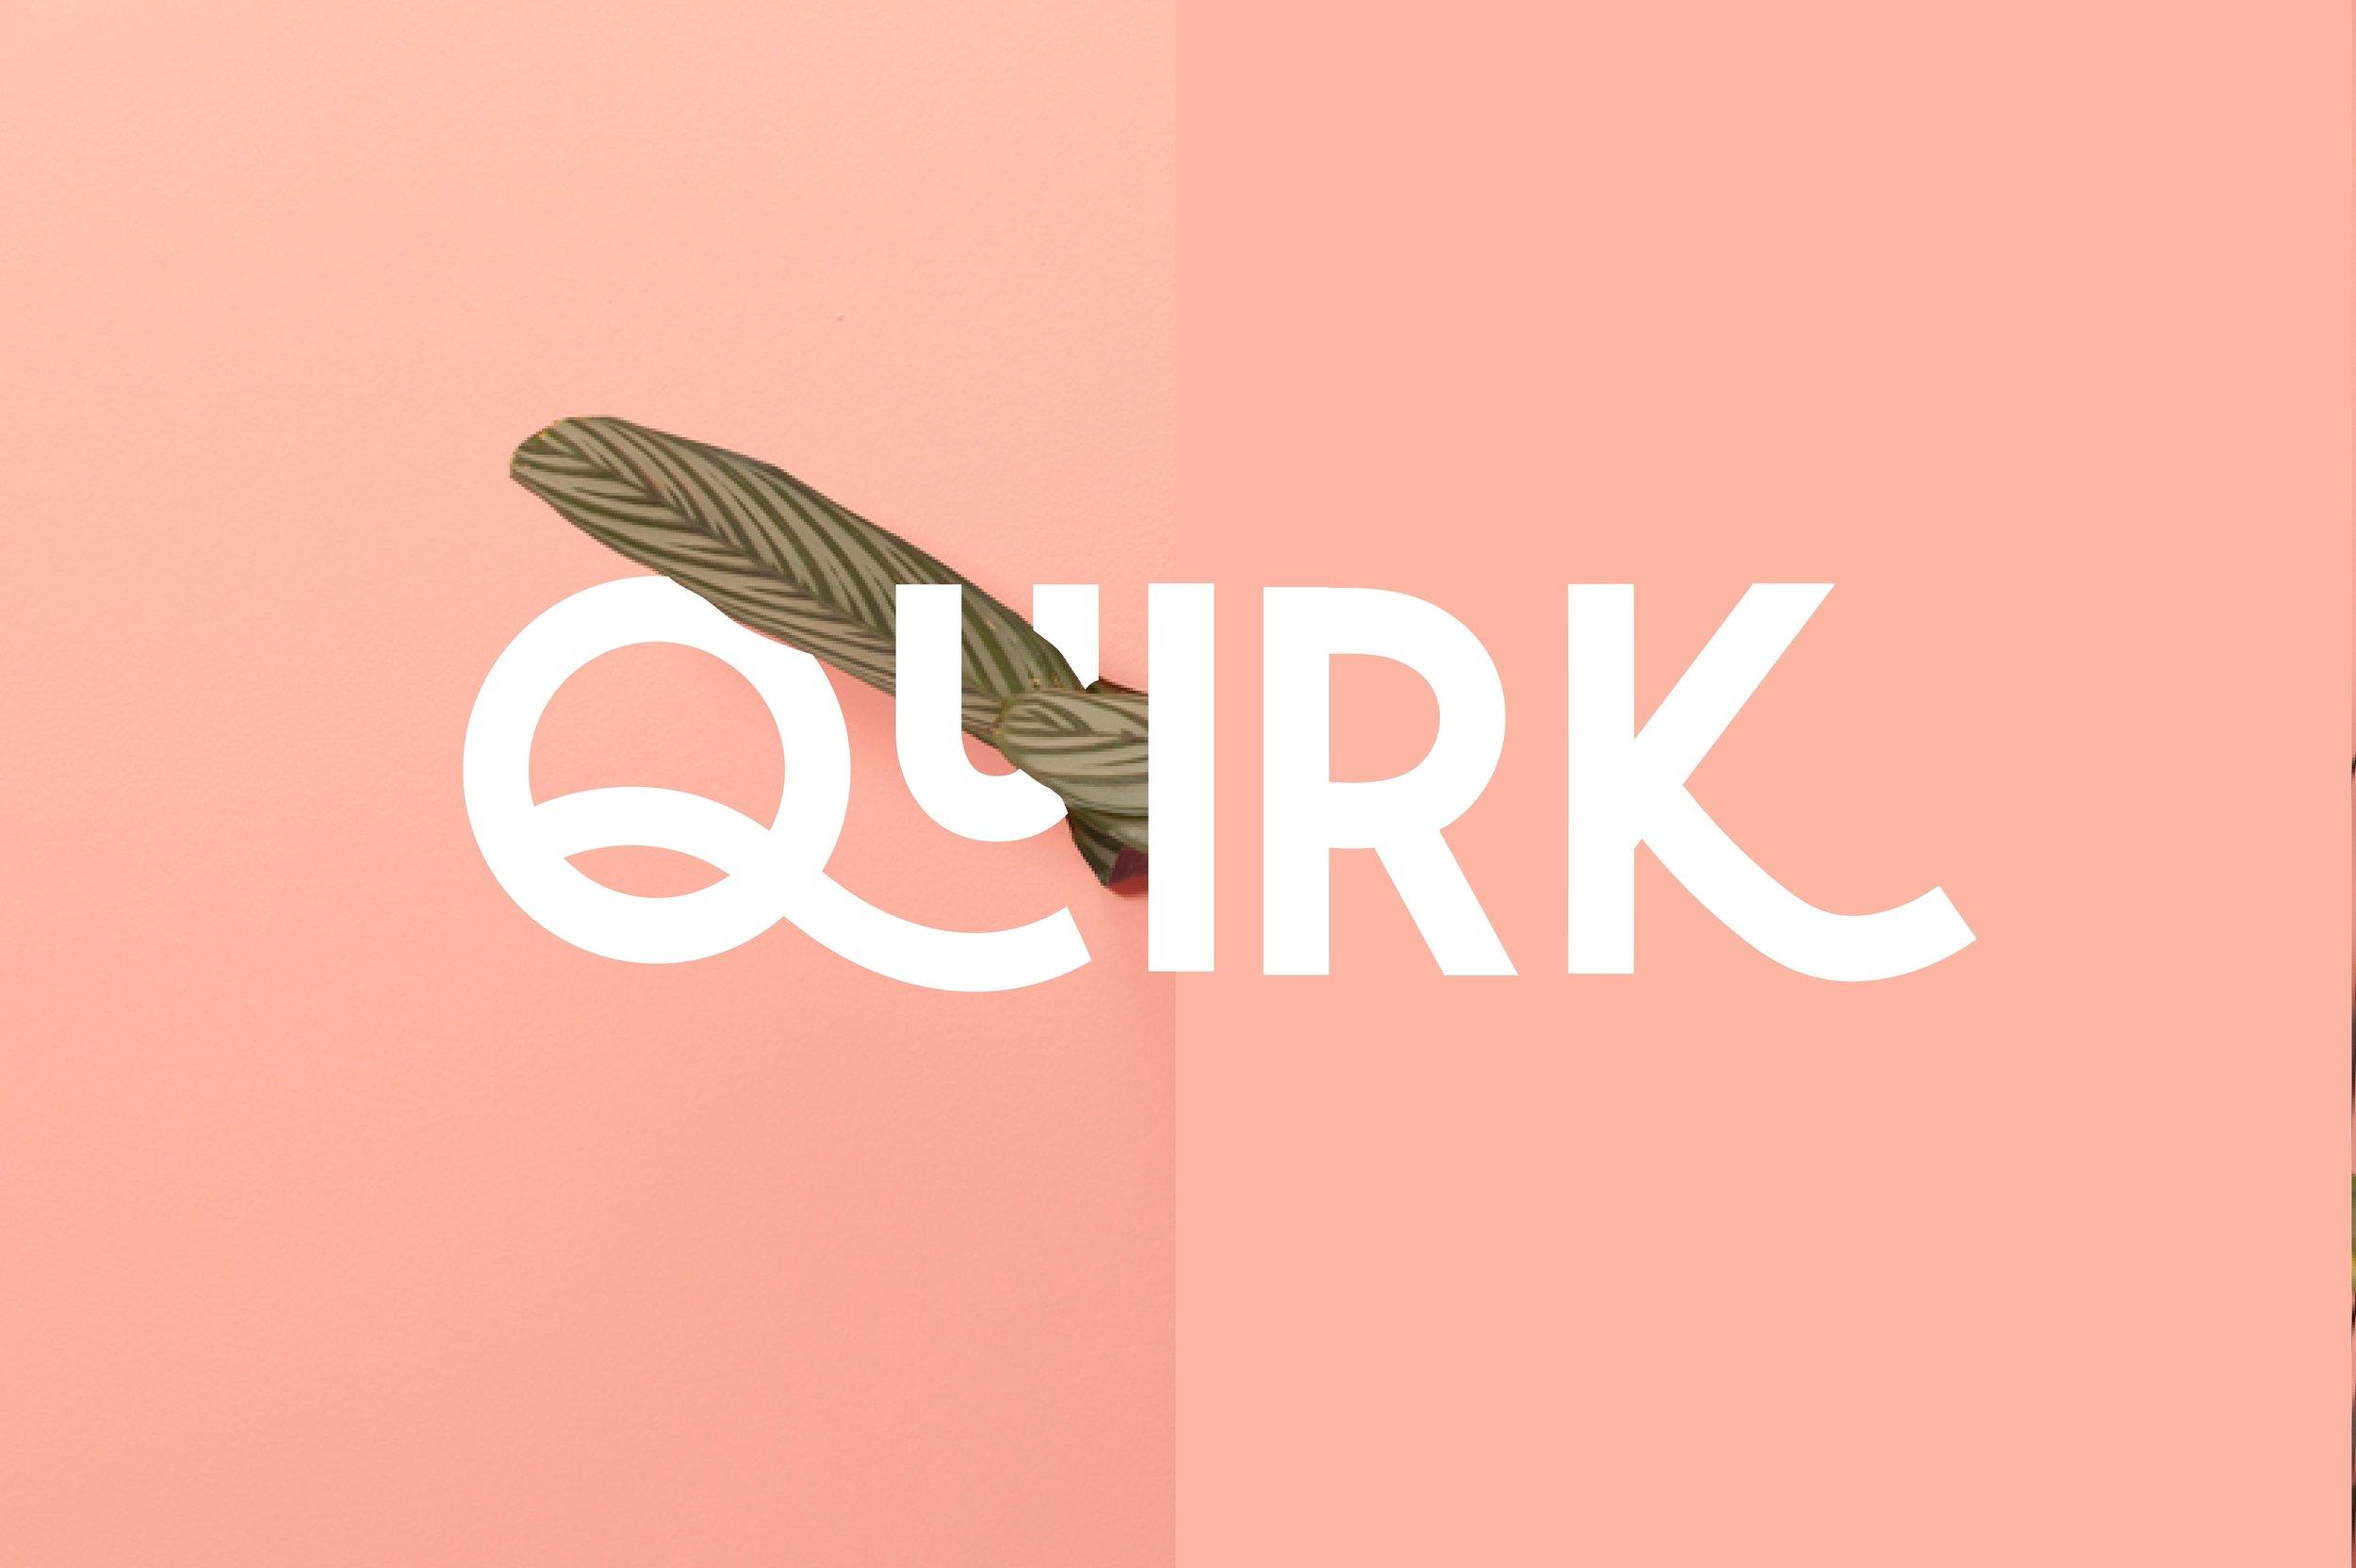 quirk-cm-01-.jpg